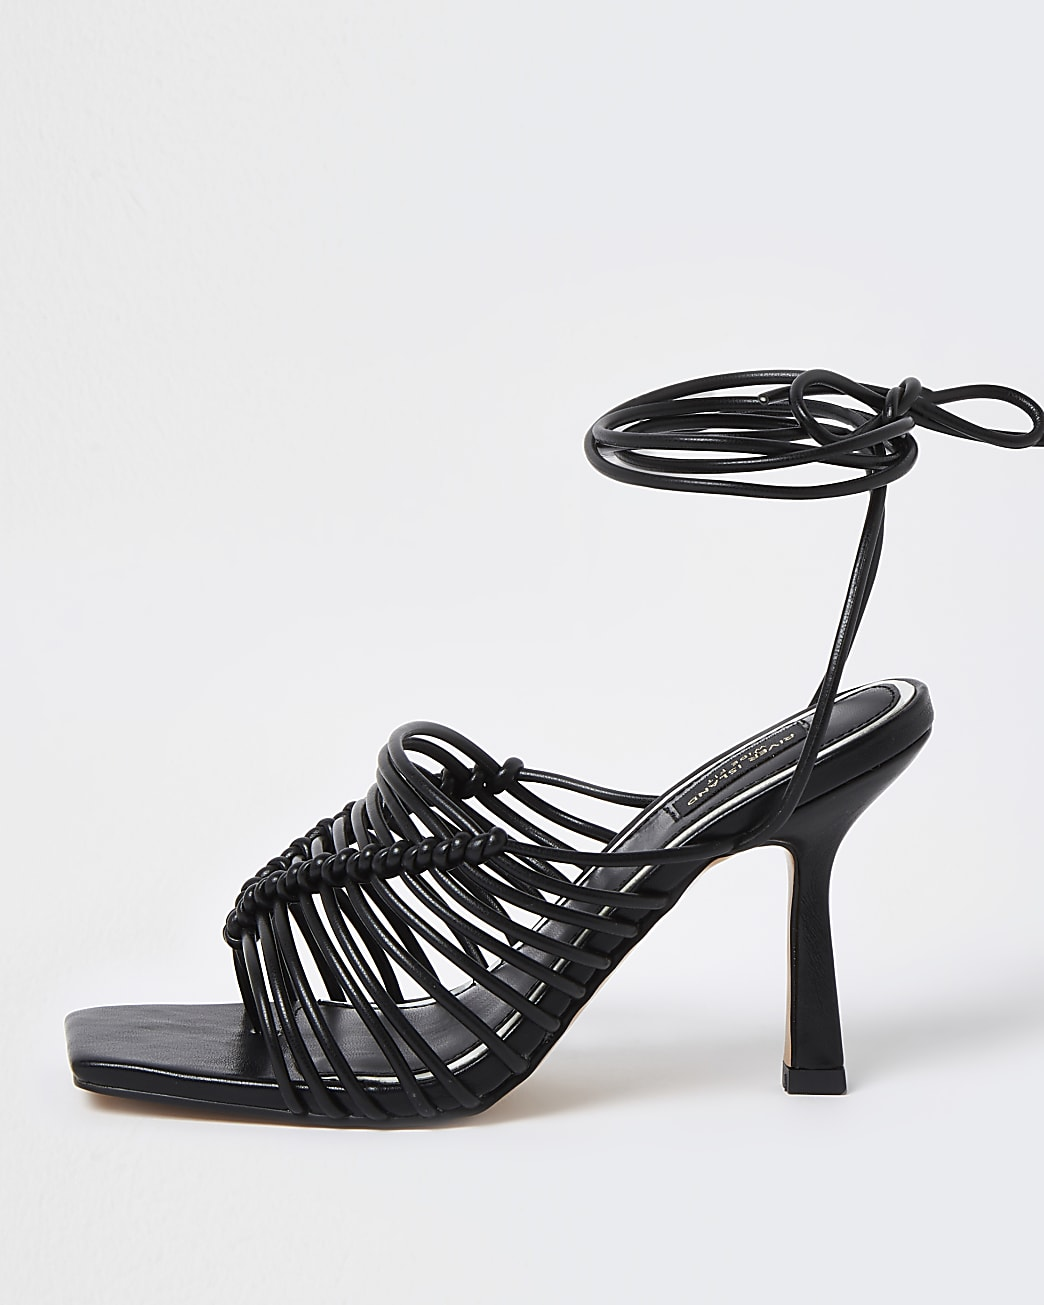 Black wide fit spaghetti strap sandal